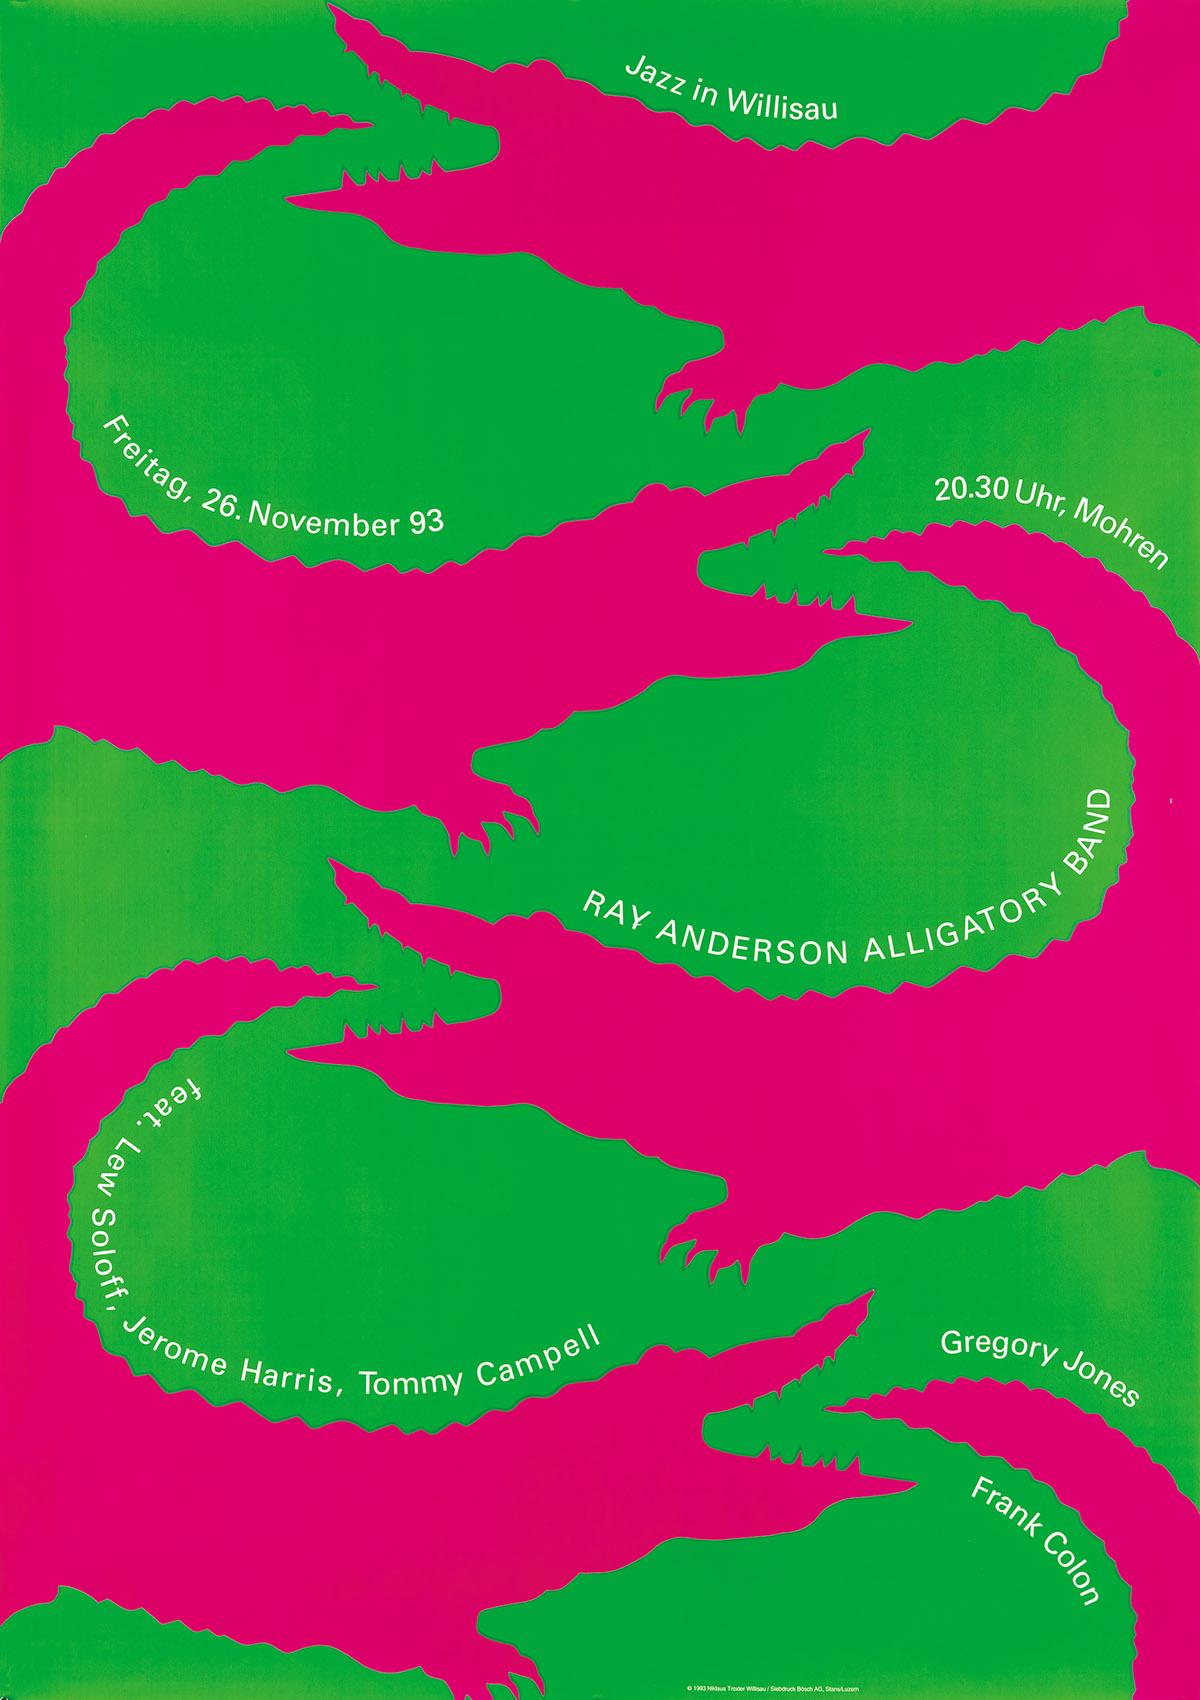 NIKLAUS-TROXLER-(1947--)-[WILLISAU-JAZZ-CONCERTS]-Group-of-5